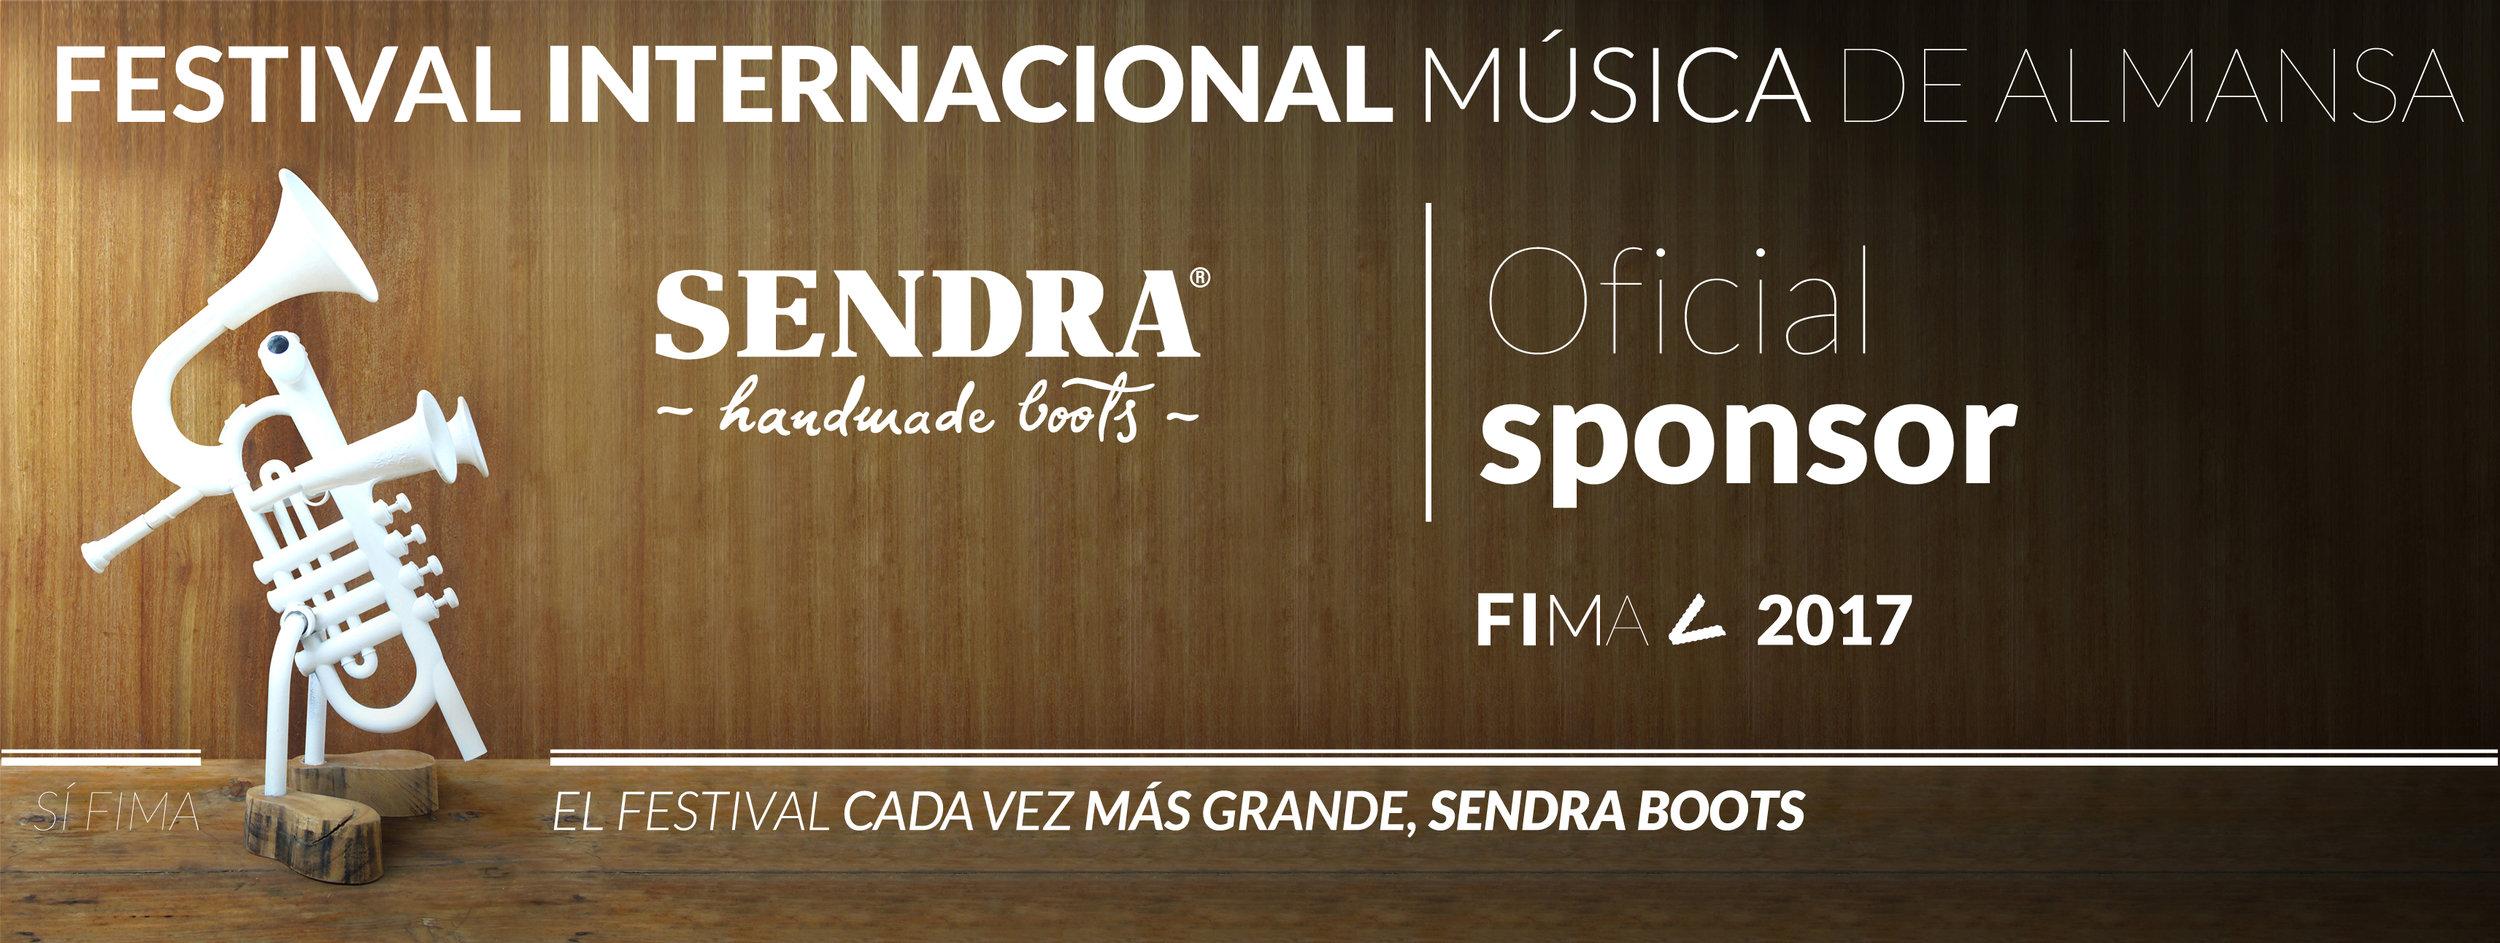 09_sponsor_sendra.jpg